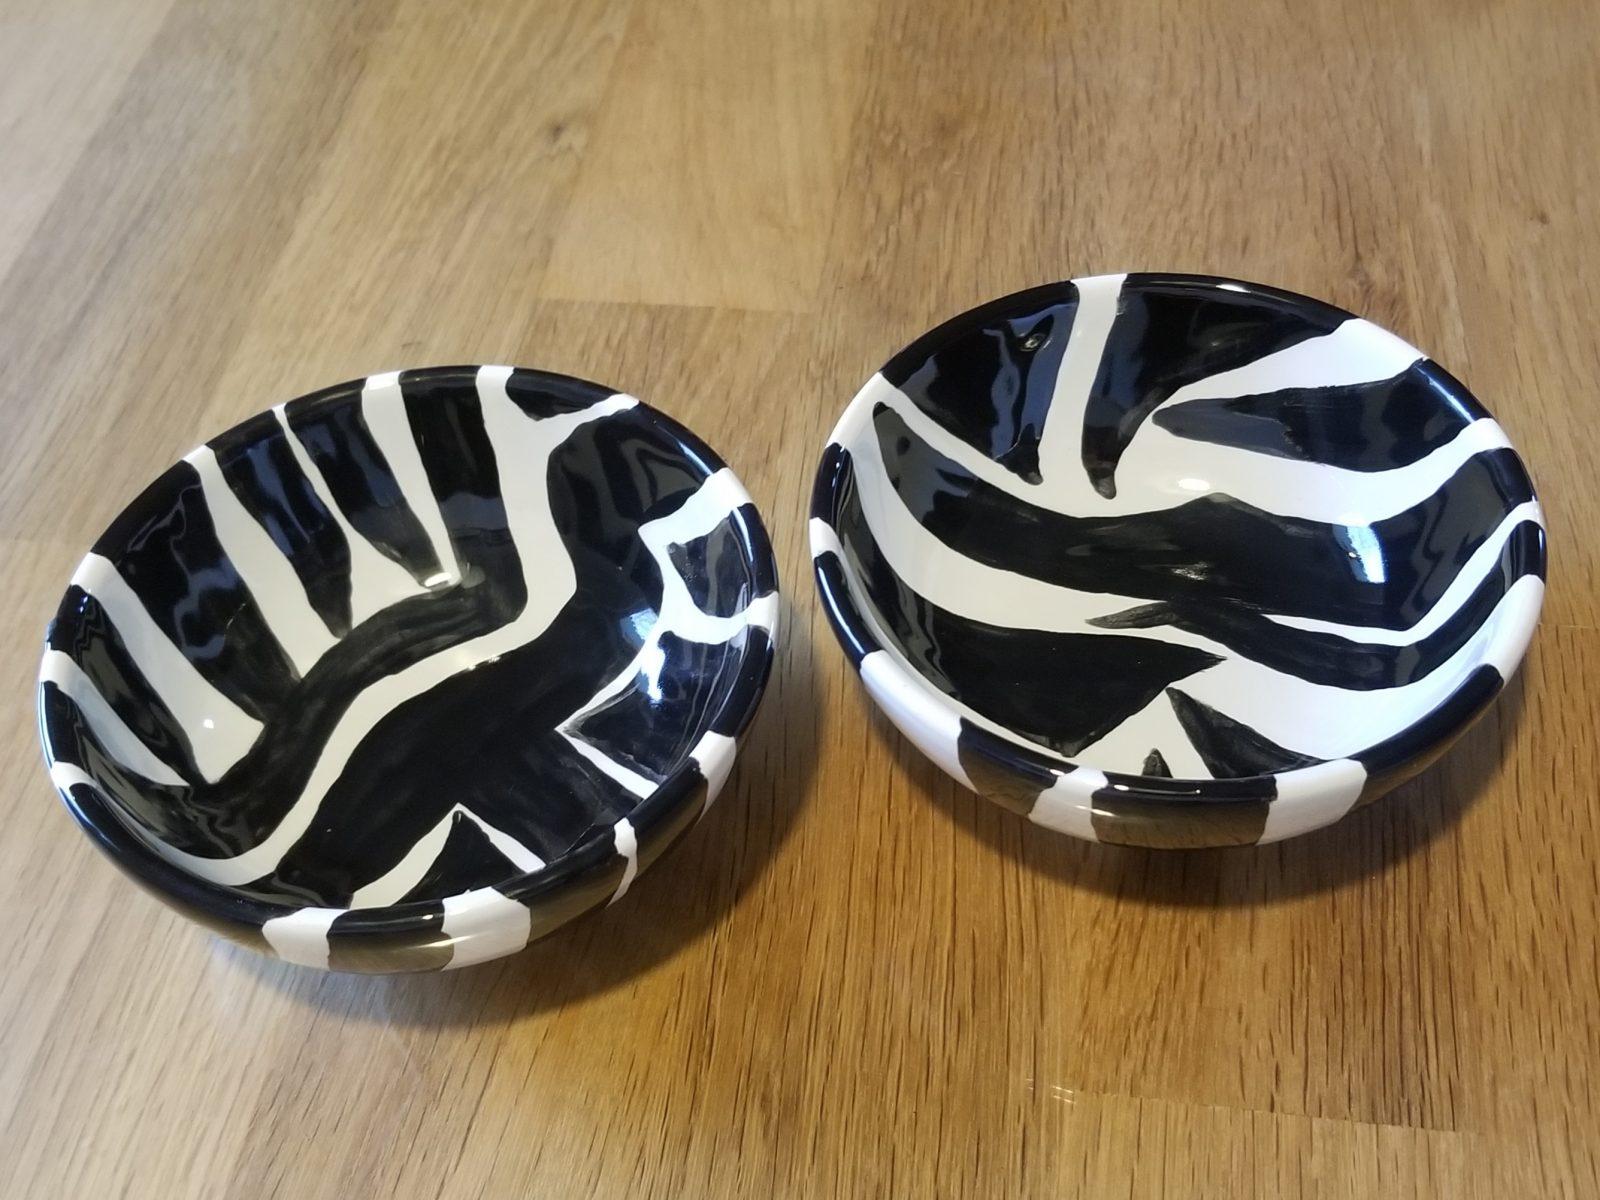 Keramik Schälchen-Set Zebra